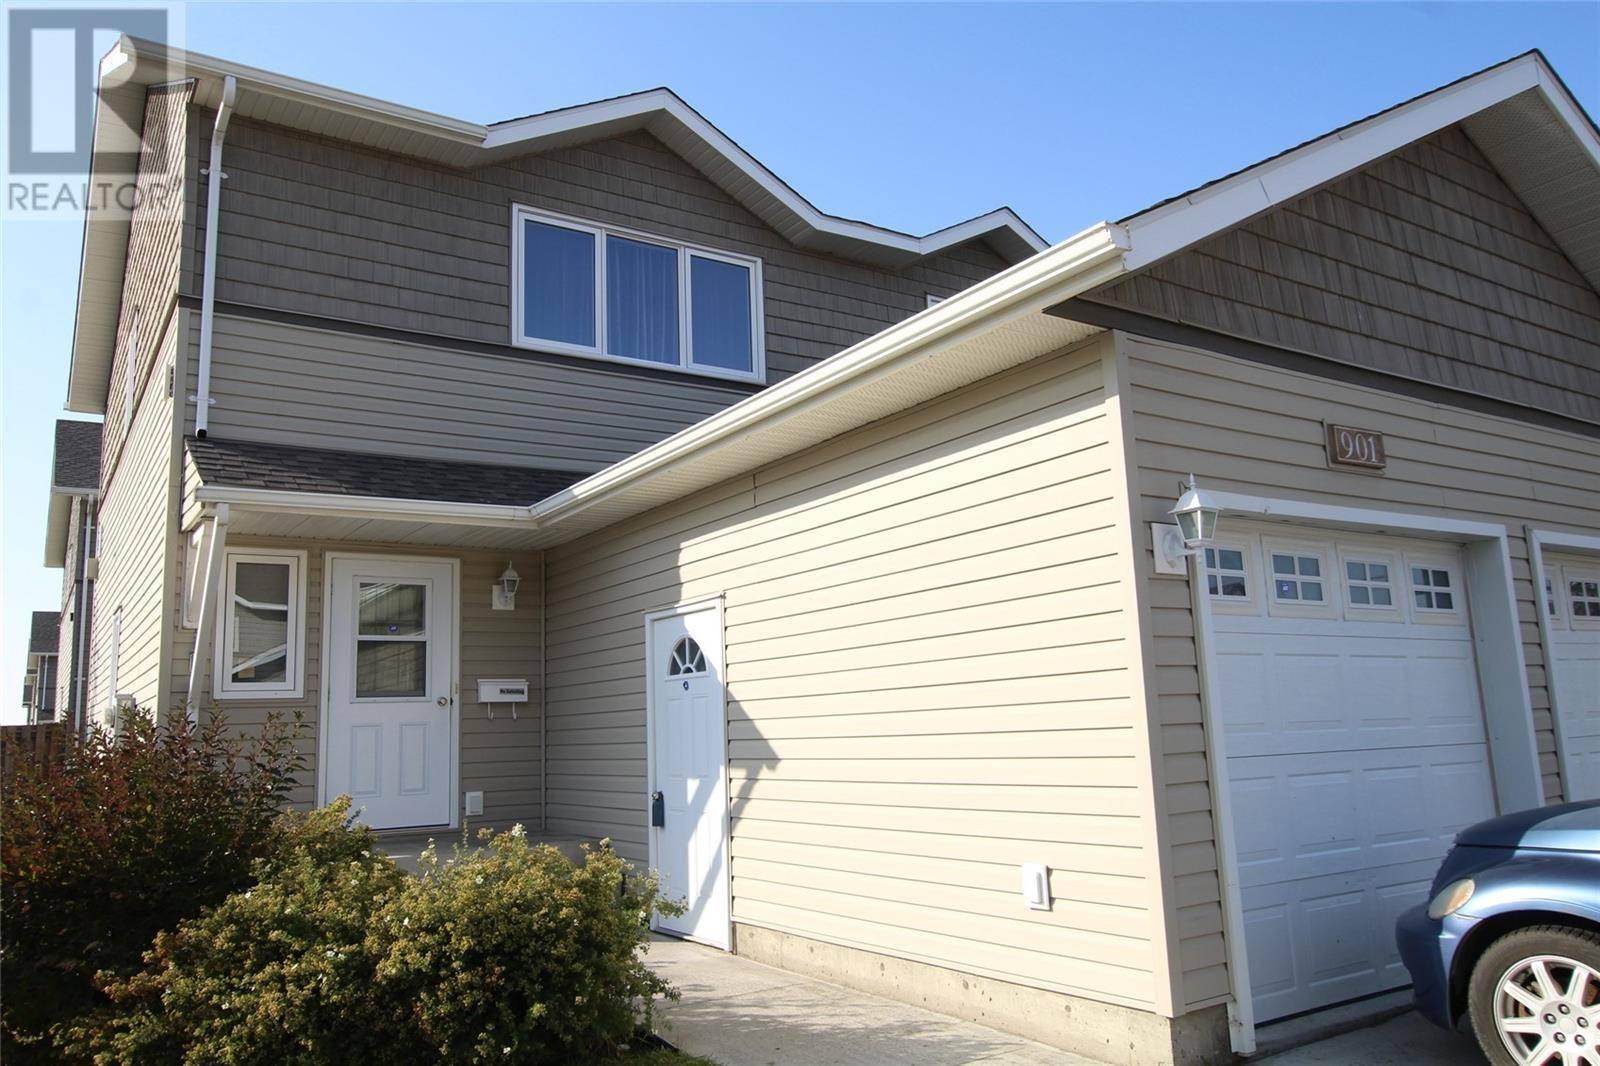 Townhouse for sale at 715 Hart Rd Unit 901 Saskatoon Saskatchewan - MLS: SK788551